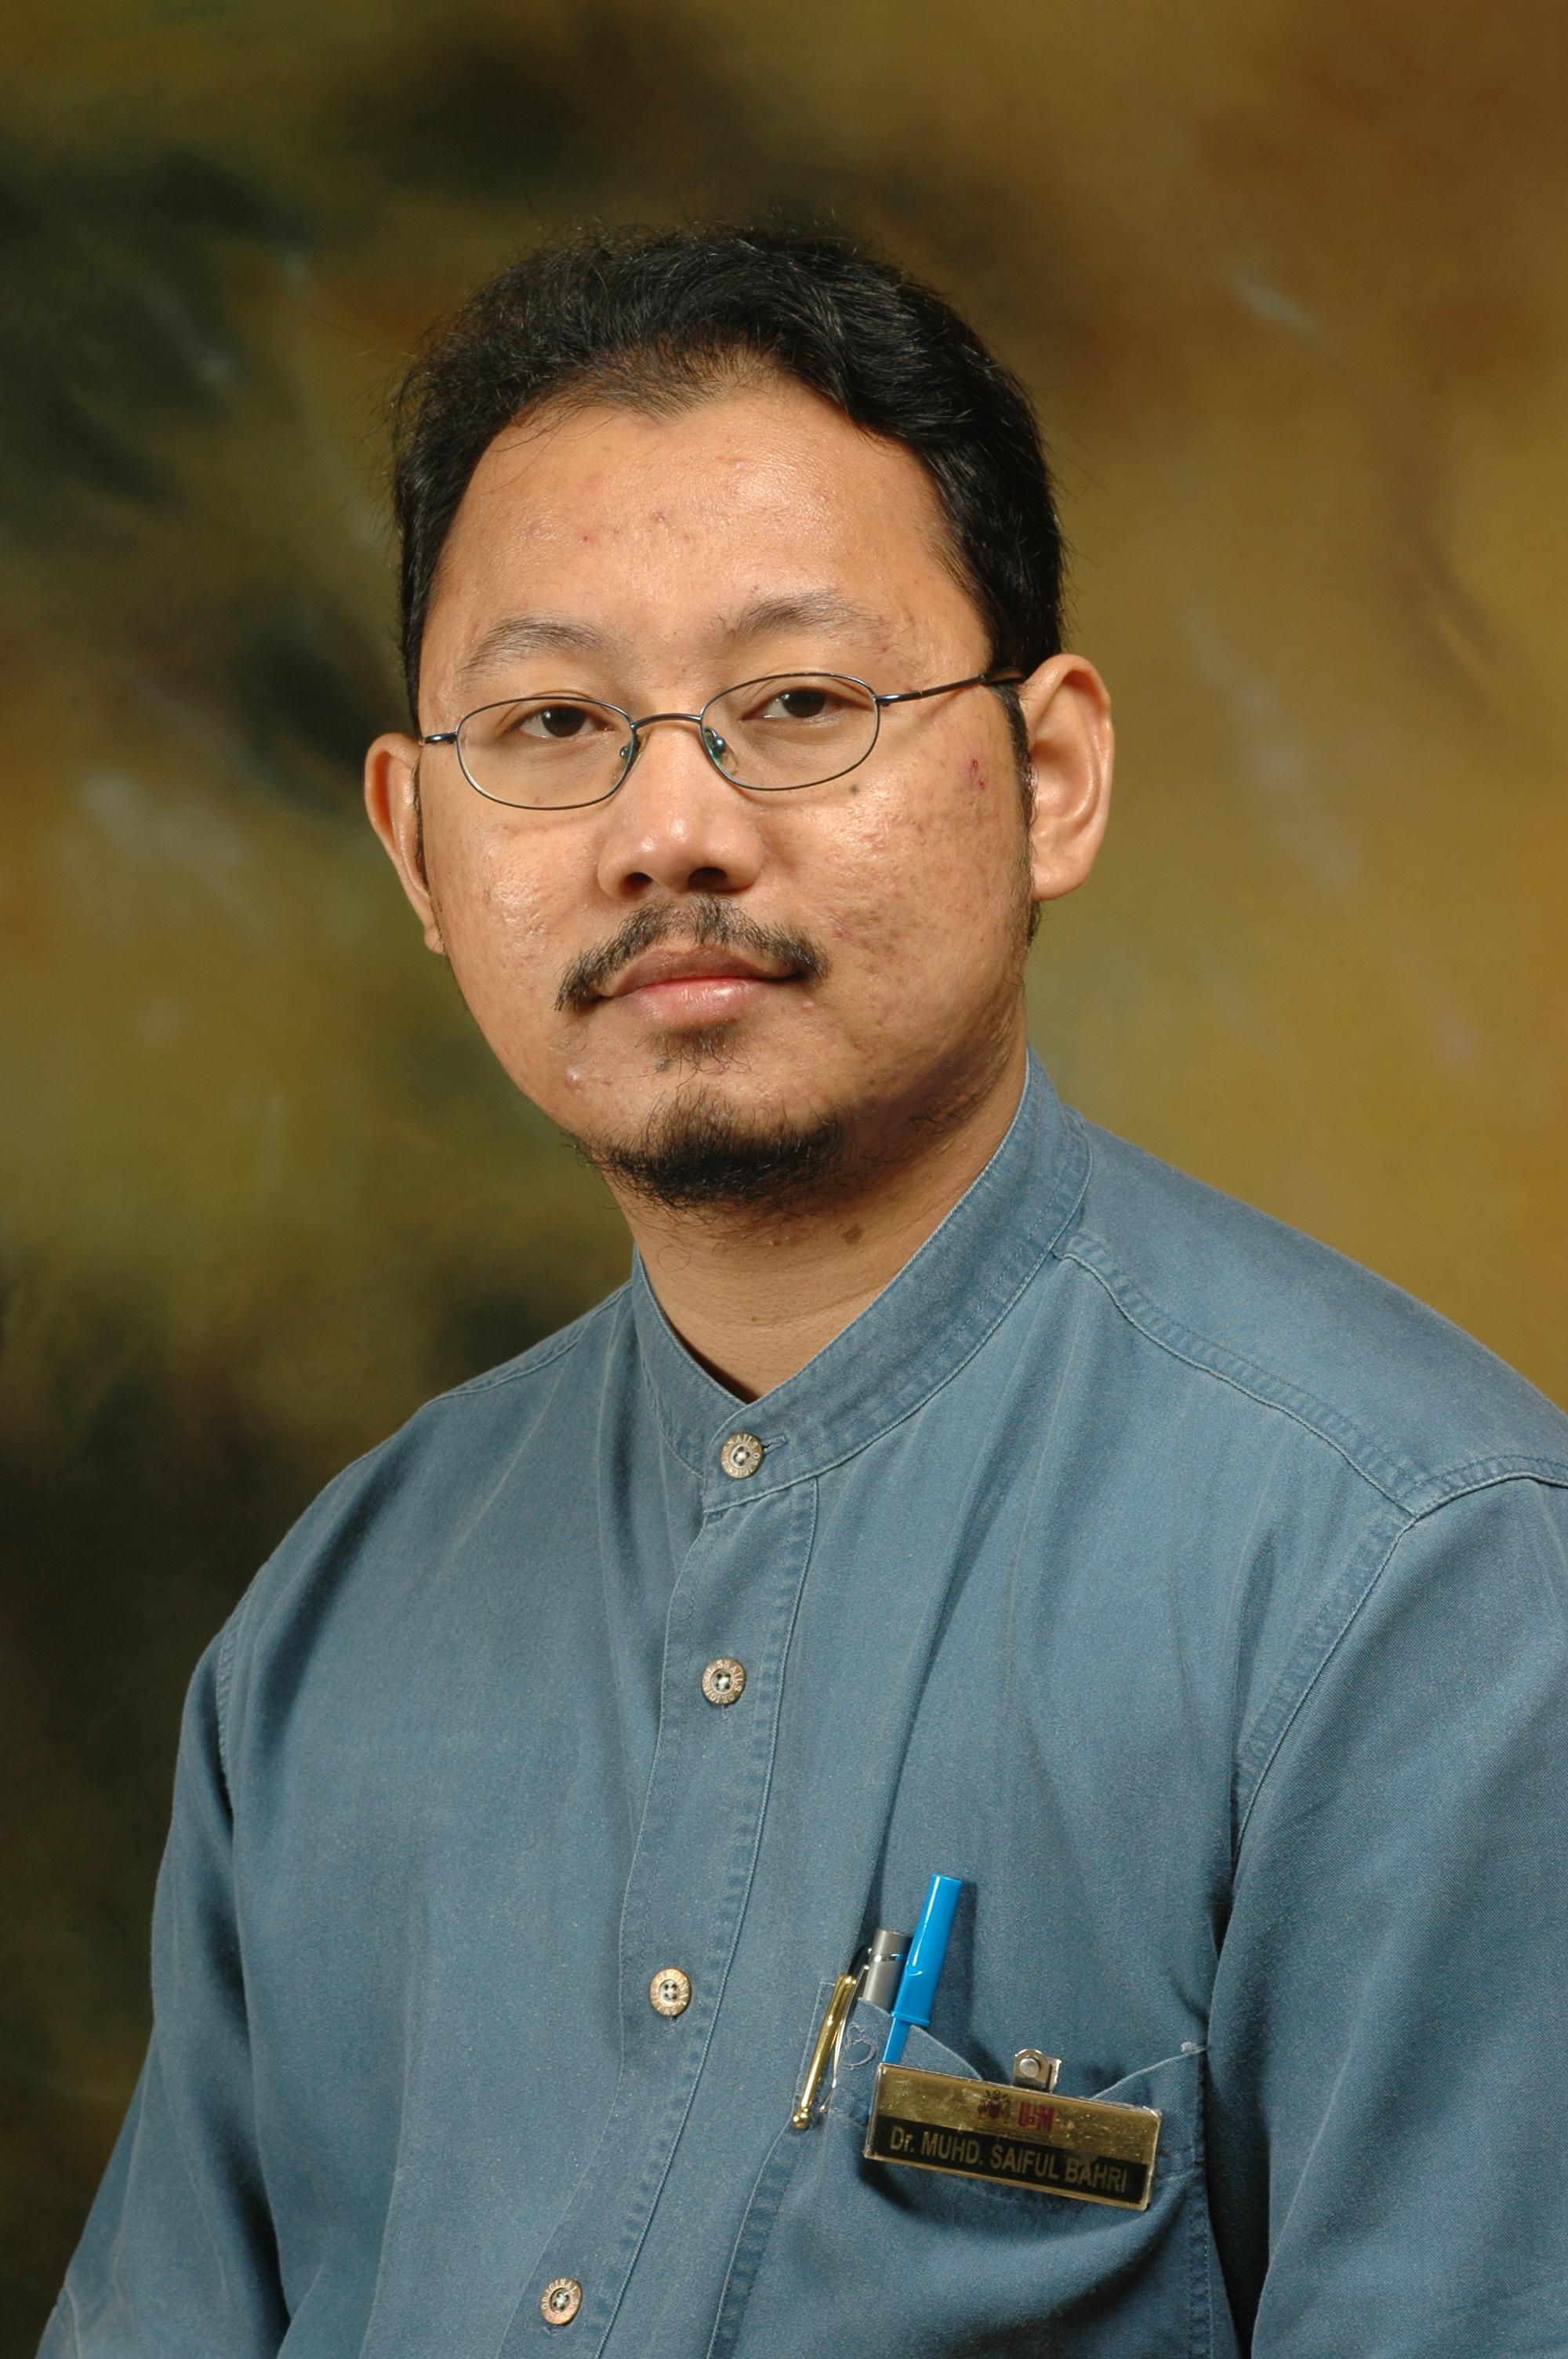 Muhamad Saiful Bahri Yusoff